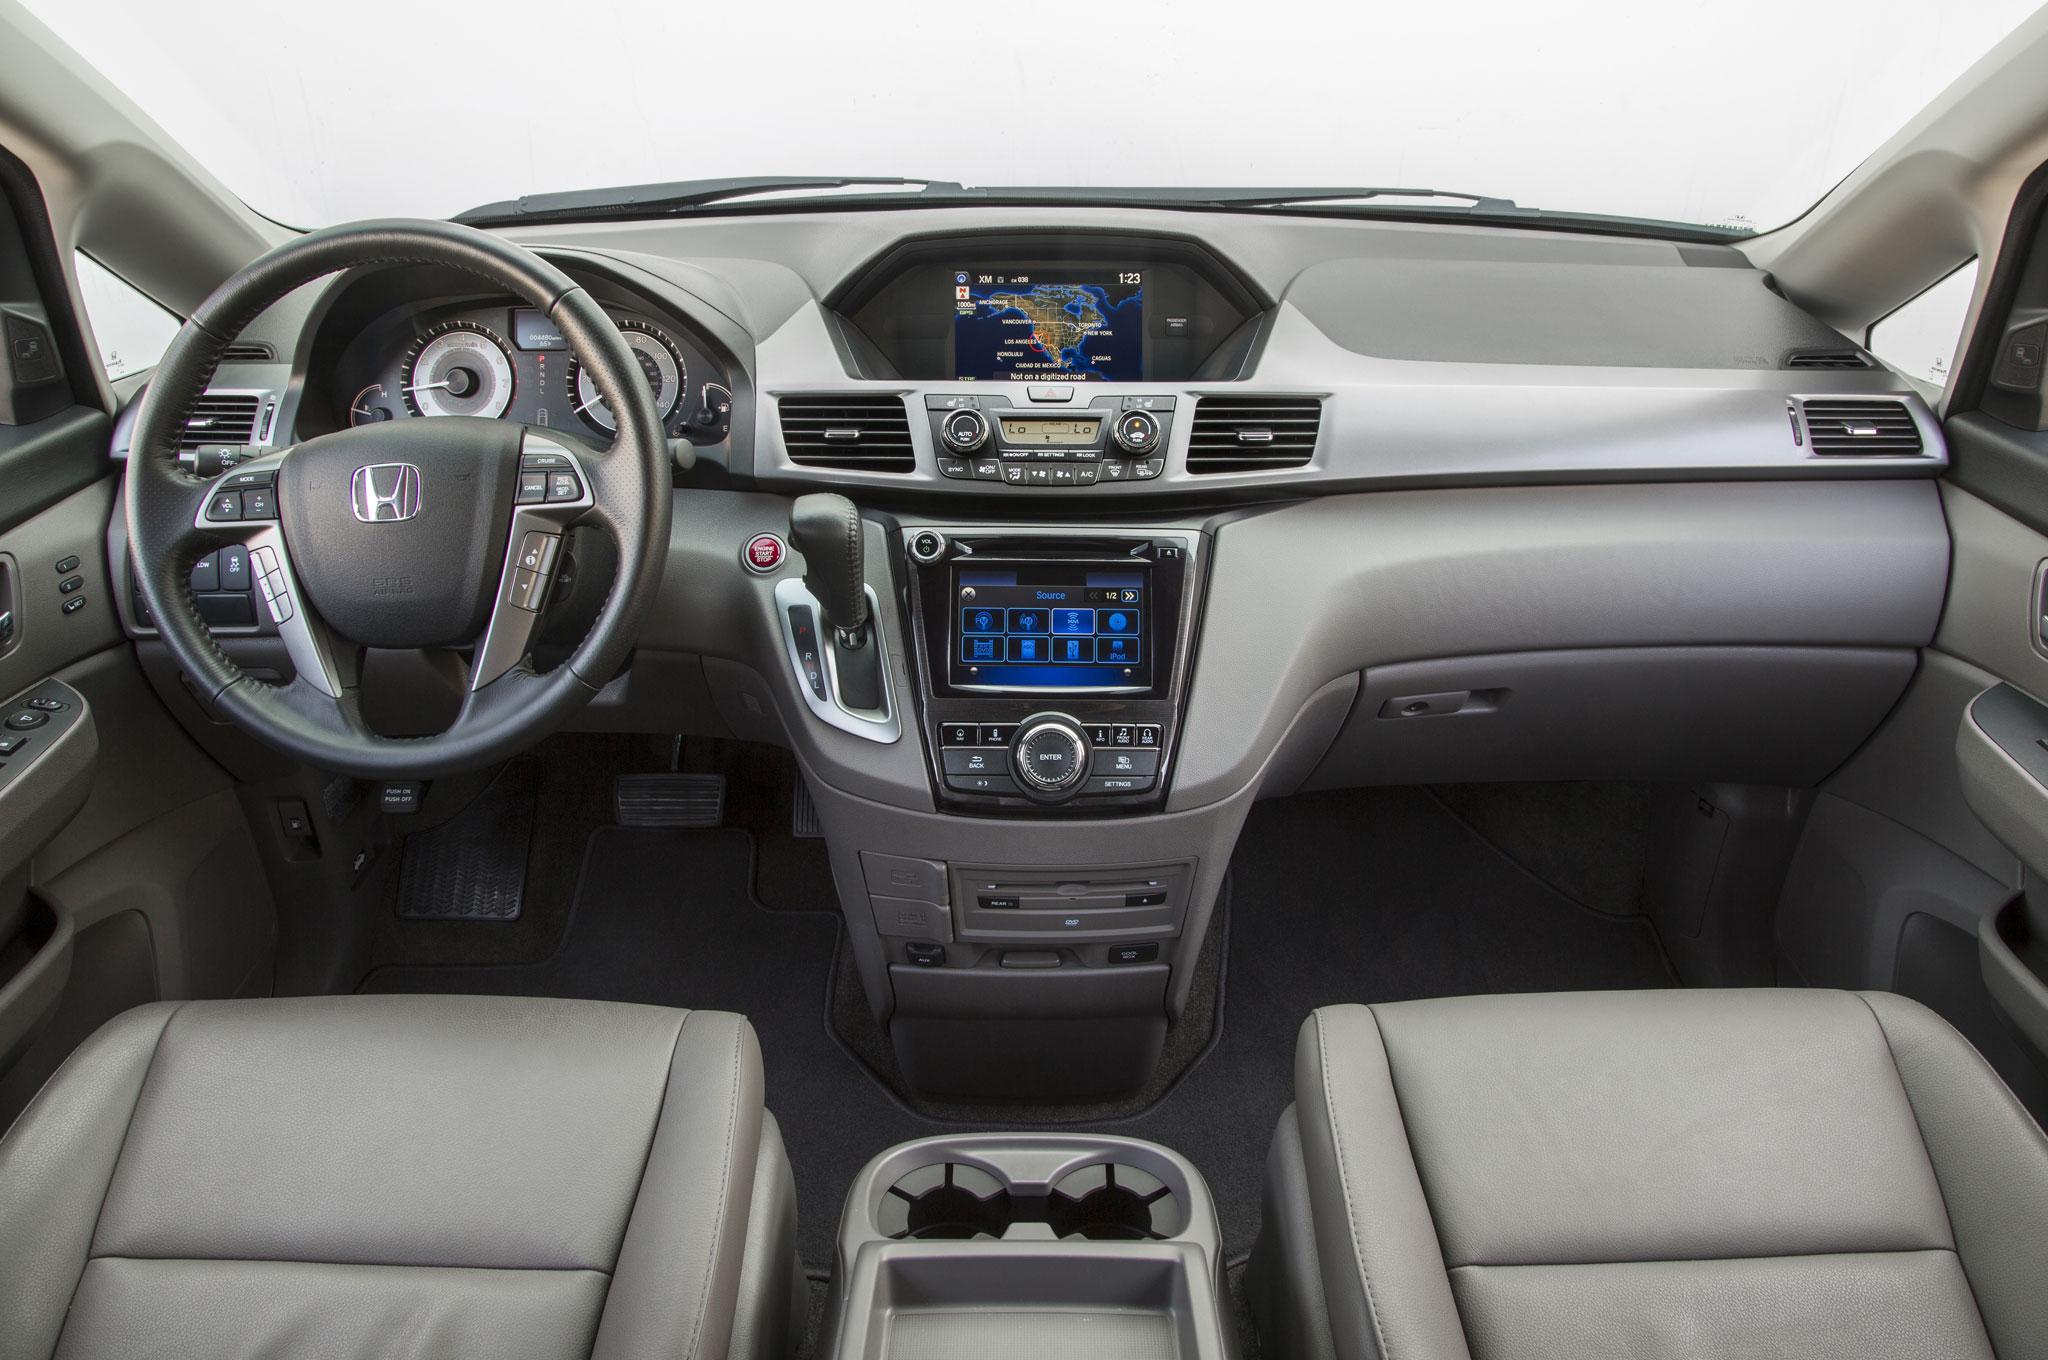 2016 Honda Odyssey Cabin 02